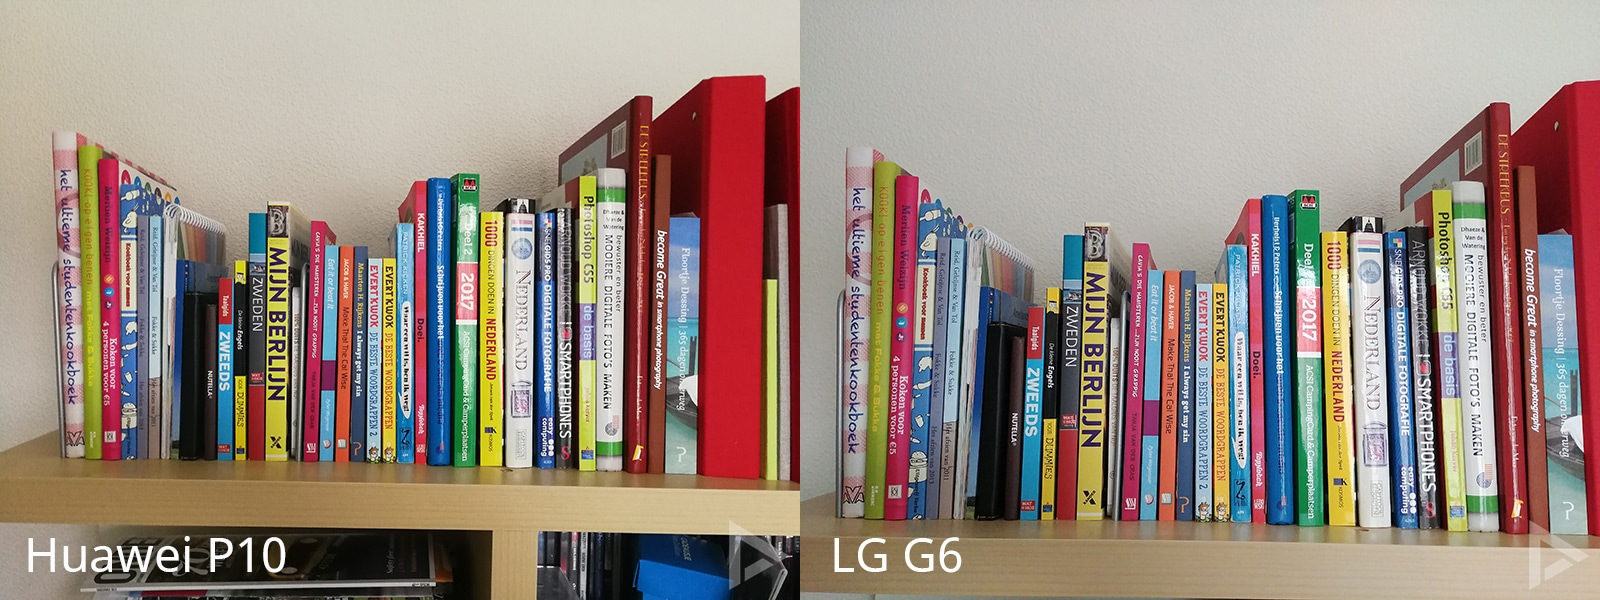 camera Huawei P10 vs LG G6